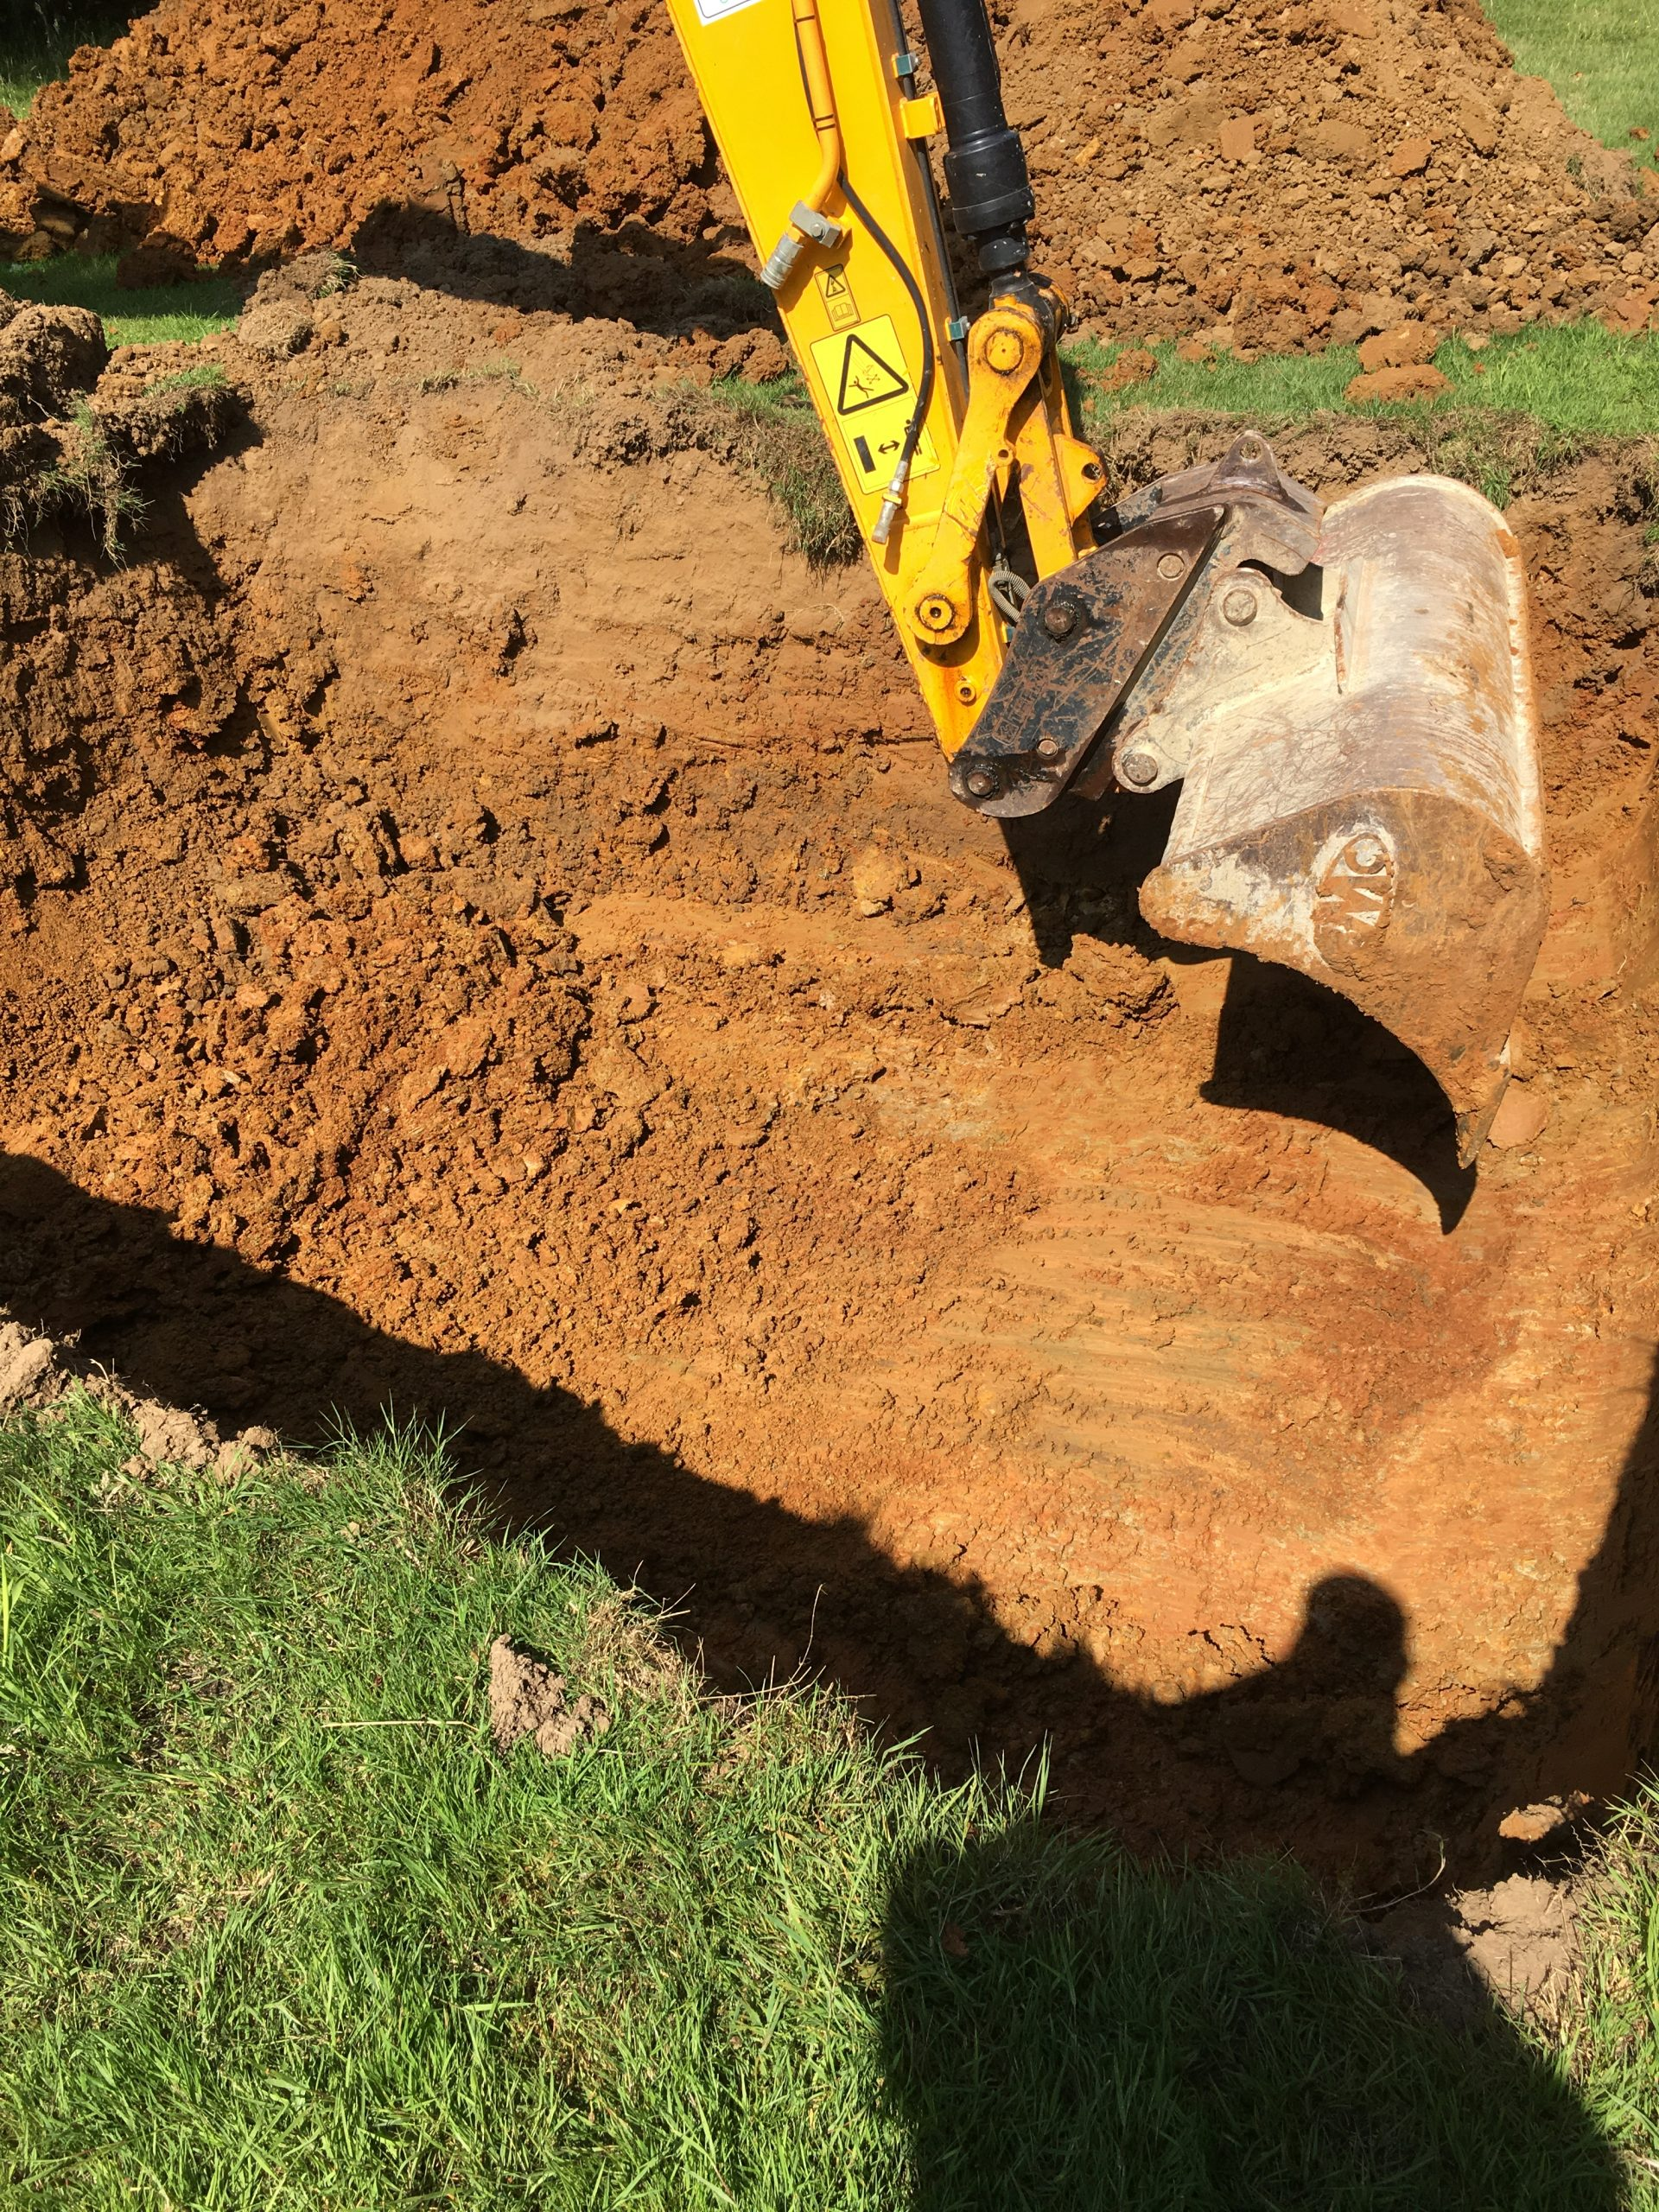 Exhumation preparation